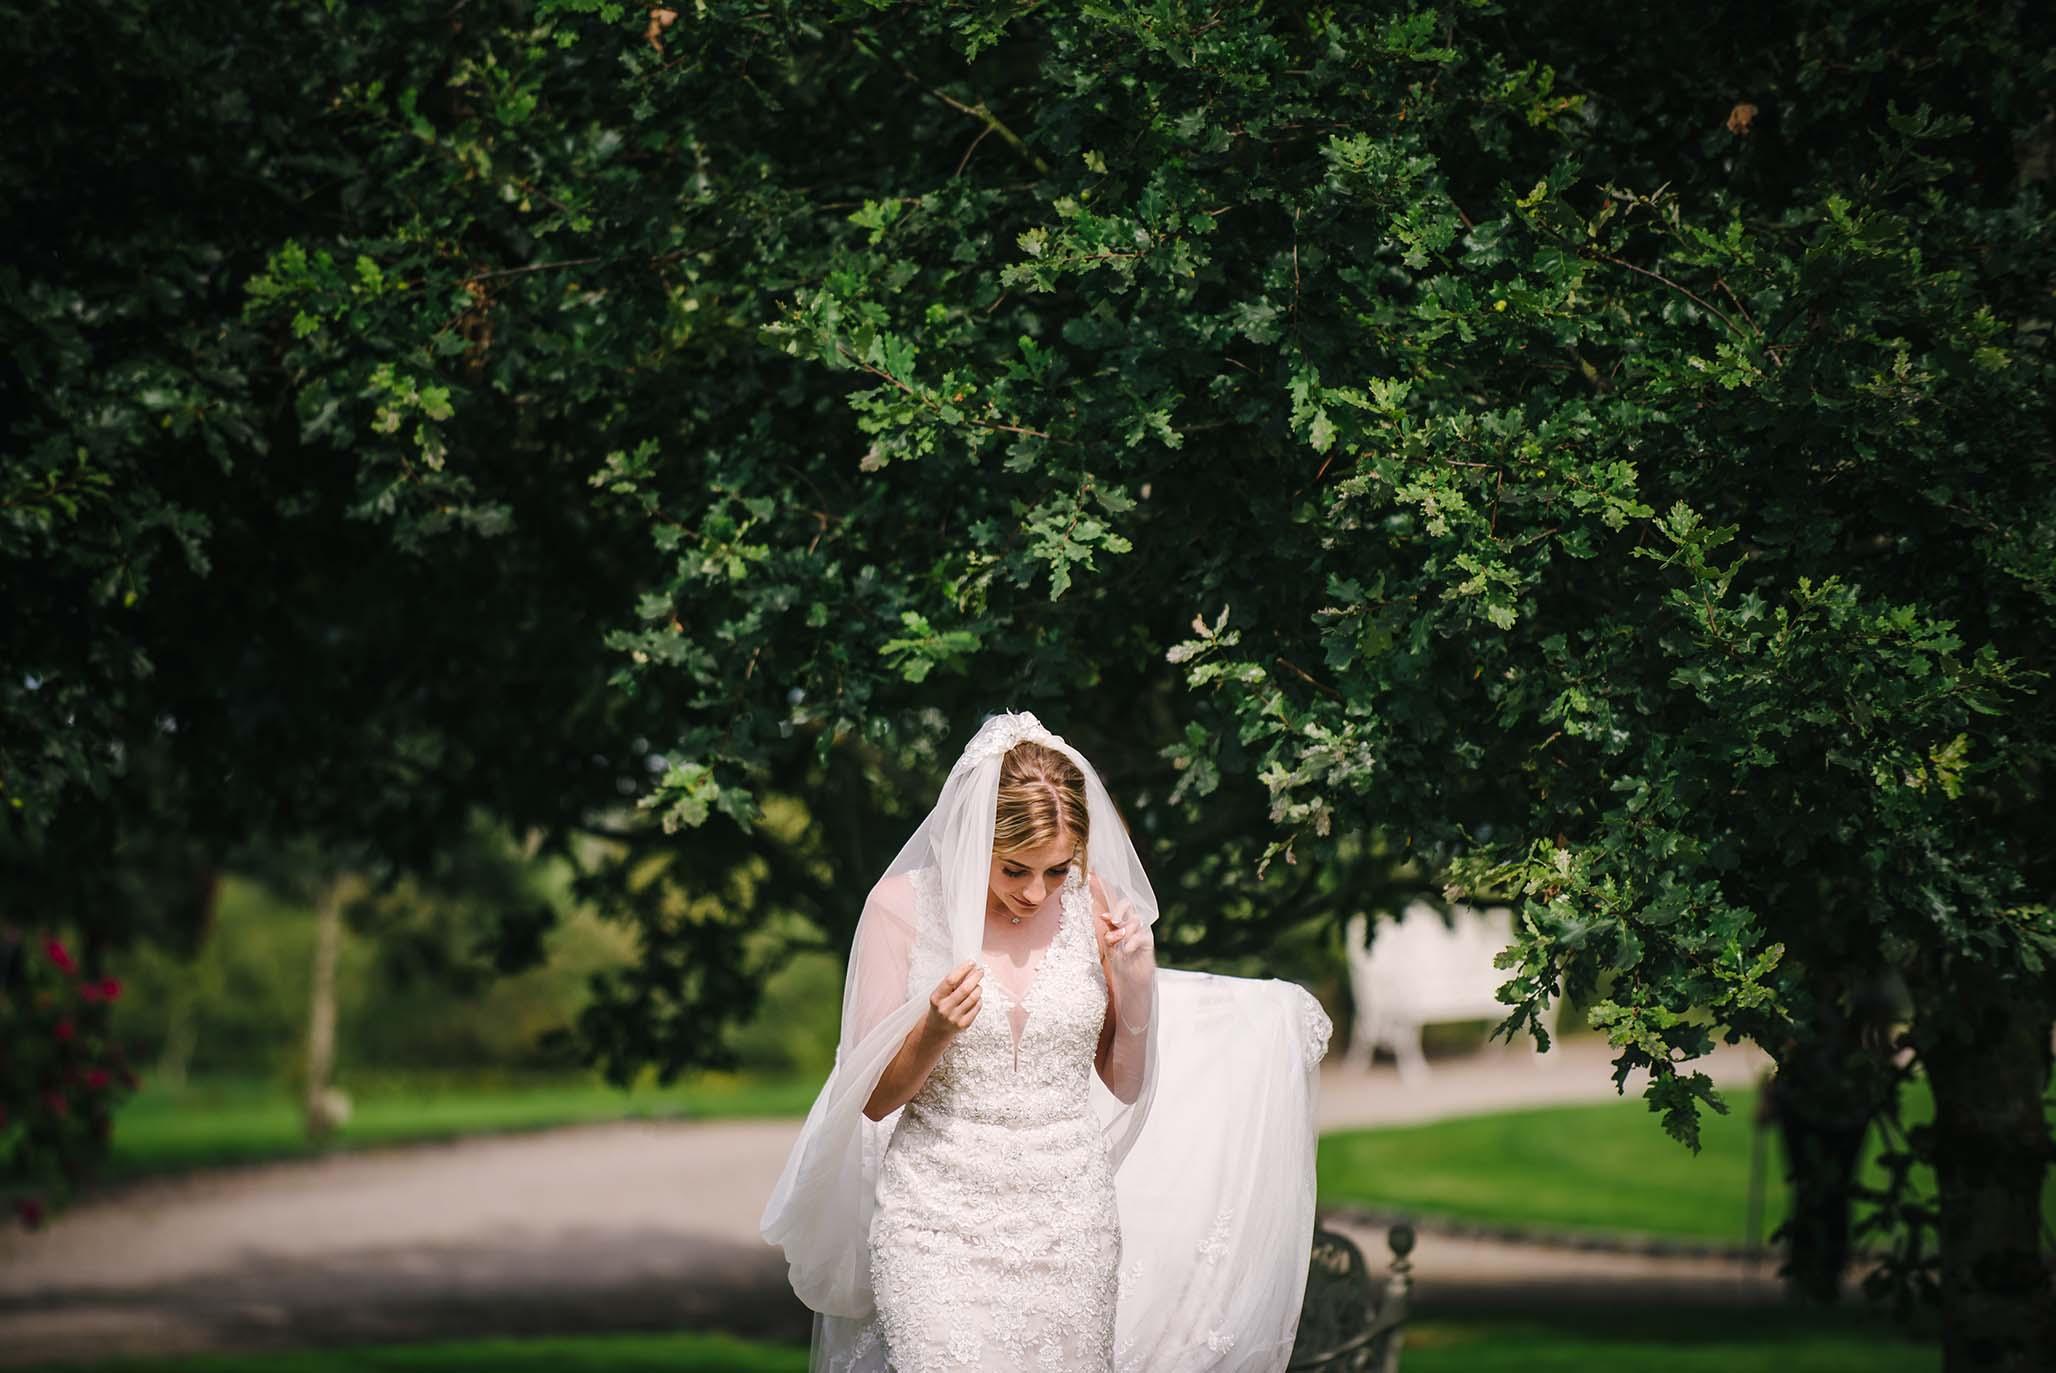 Clonabreany house wedding photographer